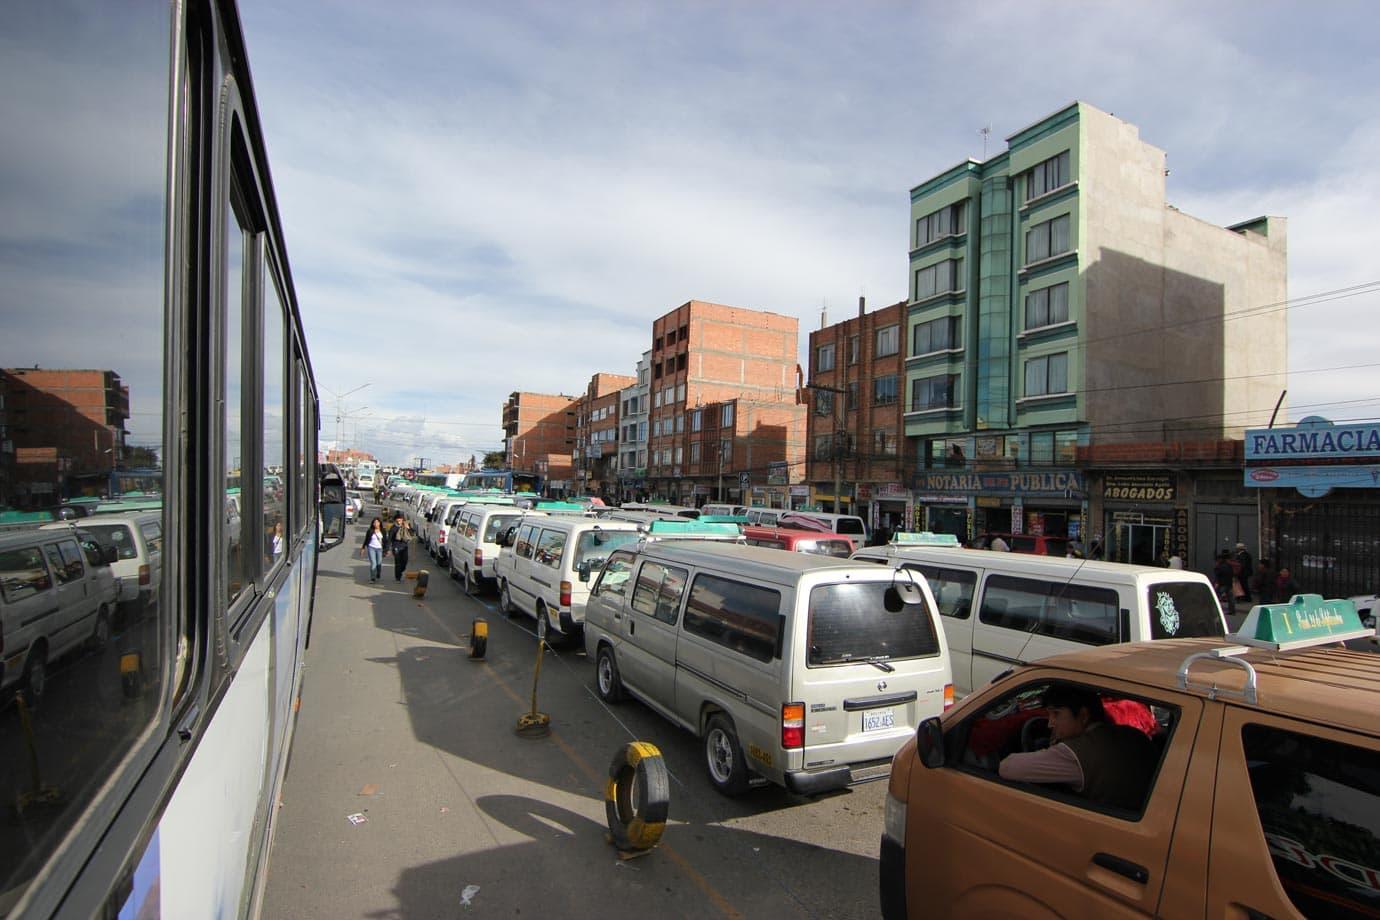 Hoards of tourist buses waiting - ©Macca Sherifi